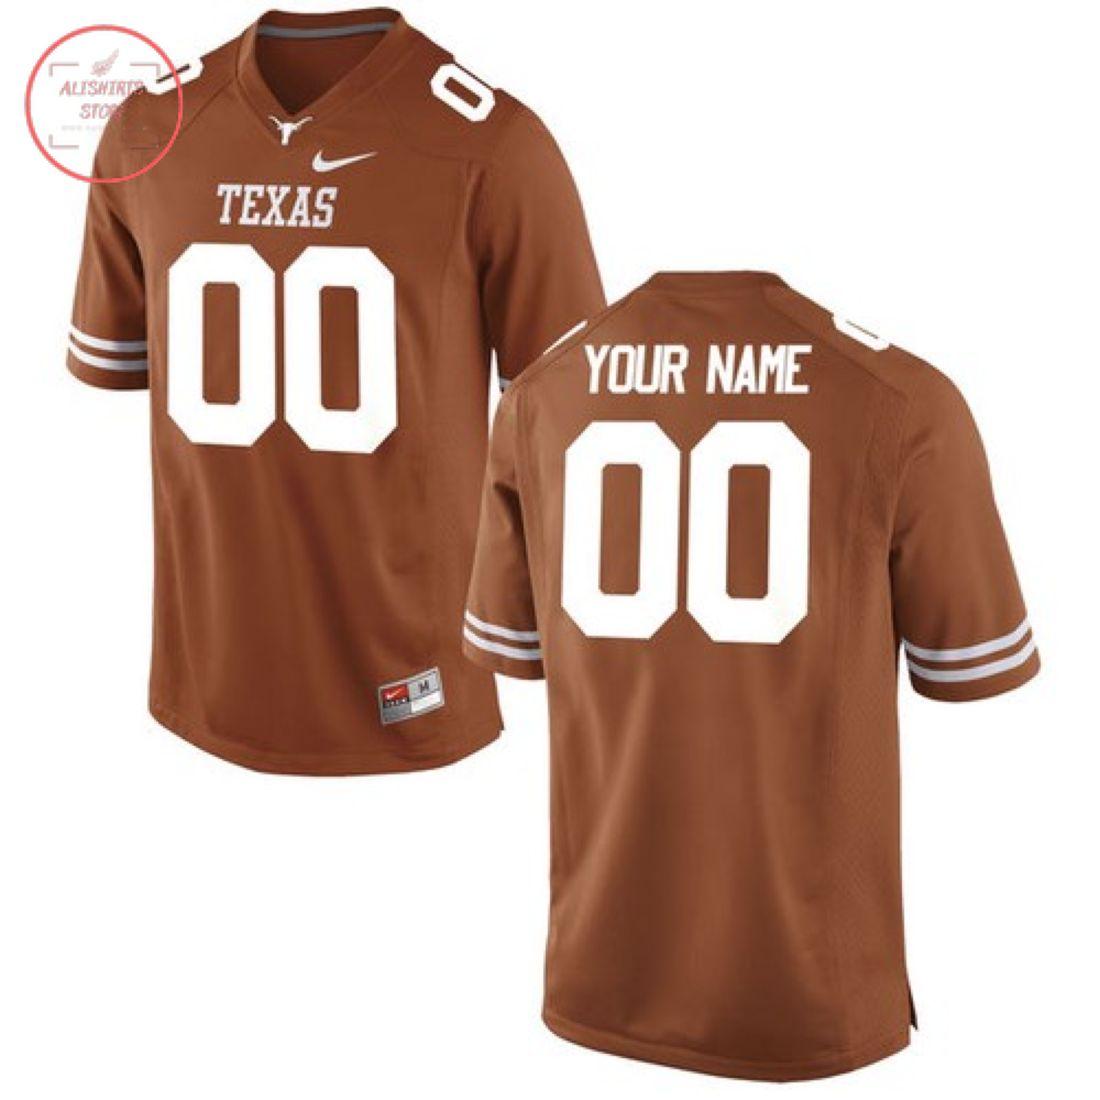 Texas Longhorns Custom Orange Football Jersey